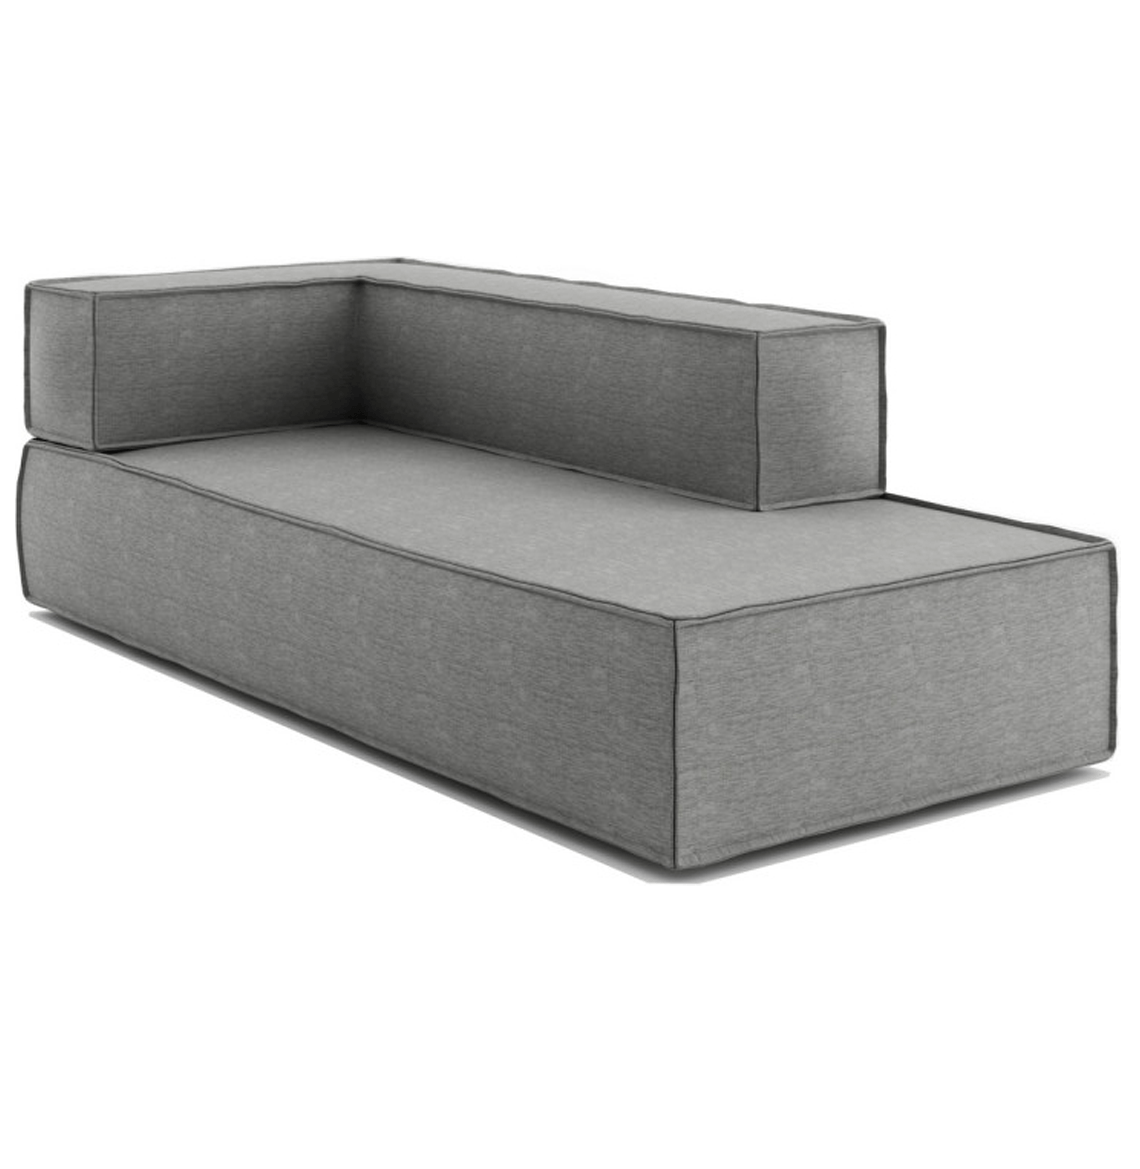 Sezlong 200×150 Basic Stang – Colectia NOI